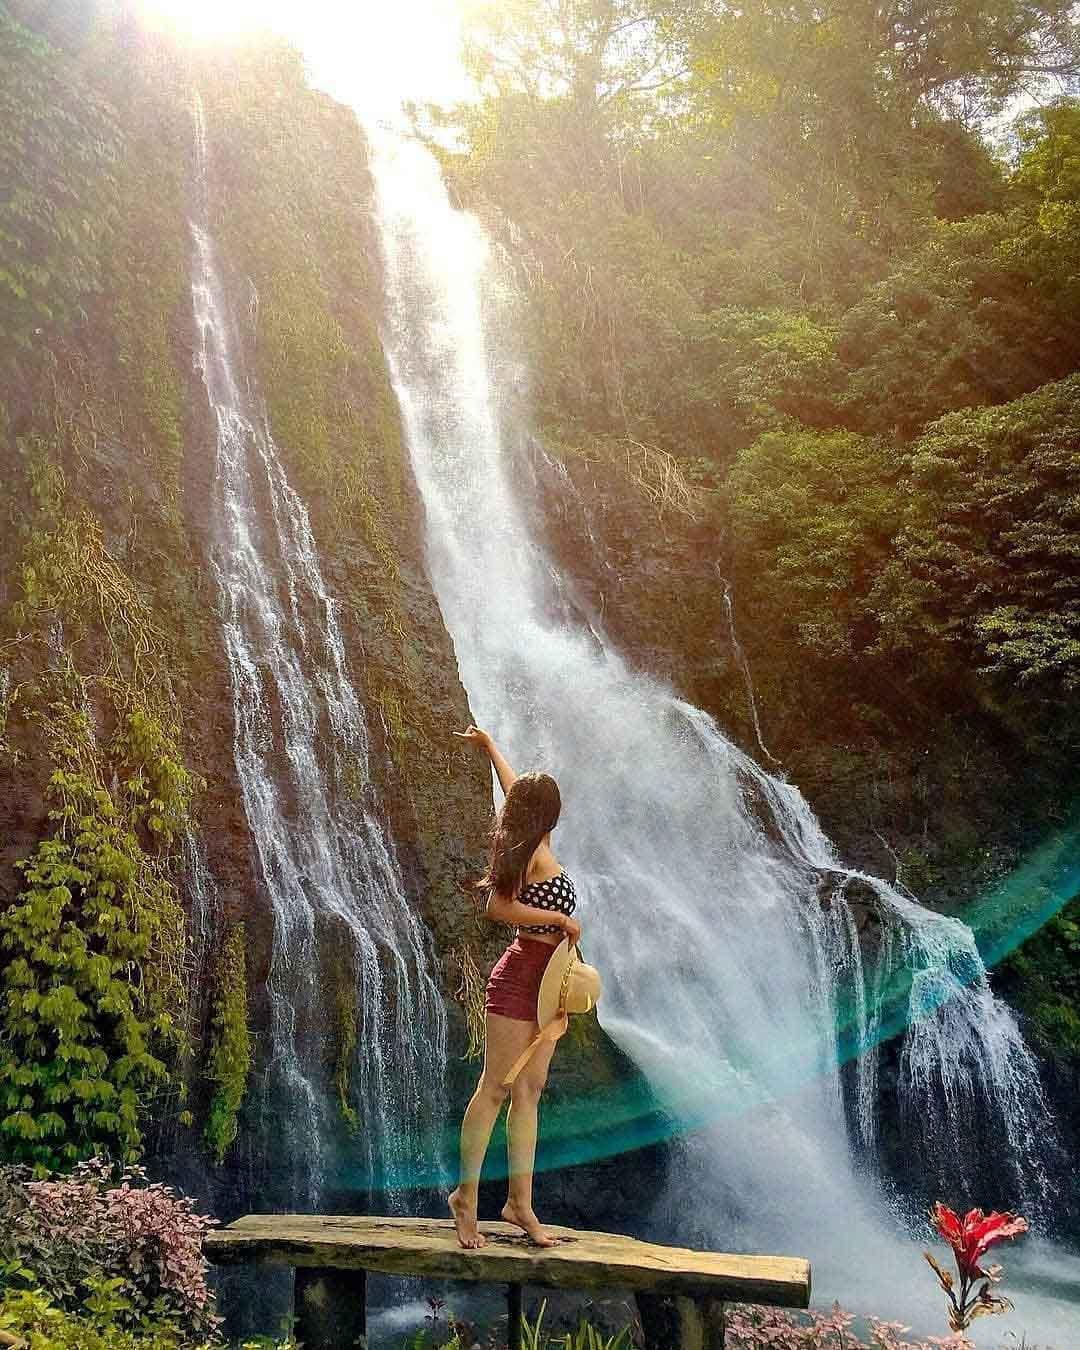 Berfoto di Air Terjun Banyumala Bali Image From @agussuradnyana.official